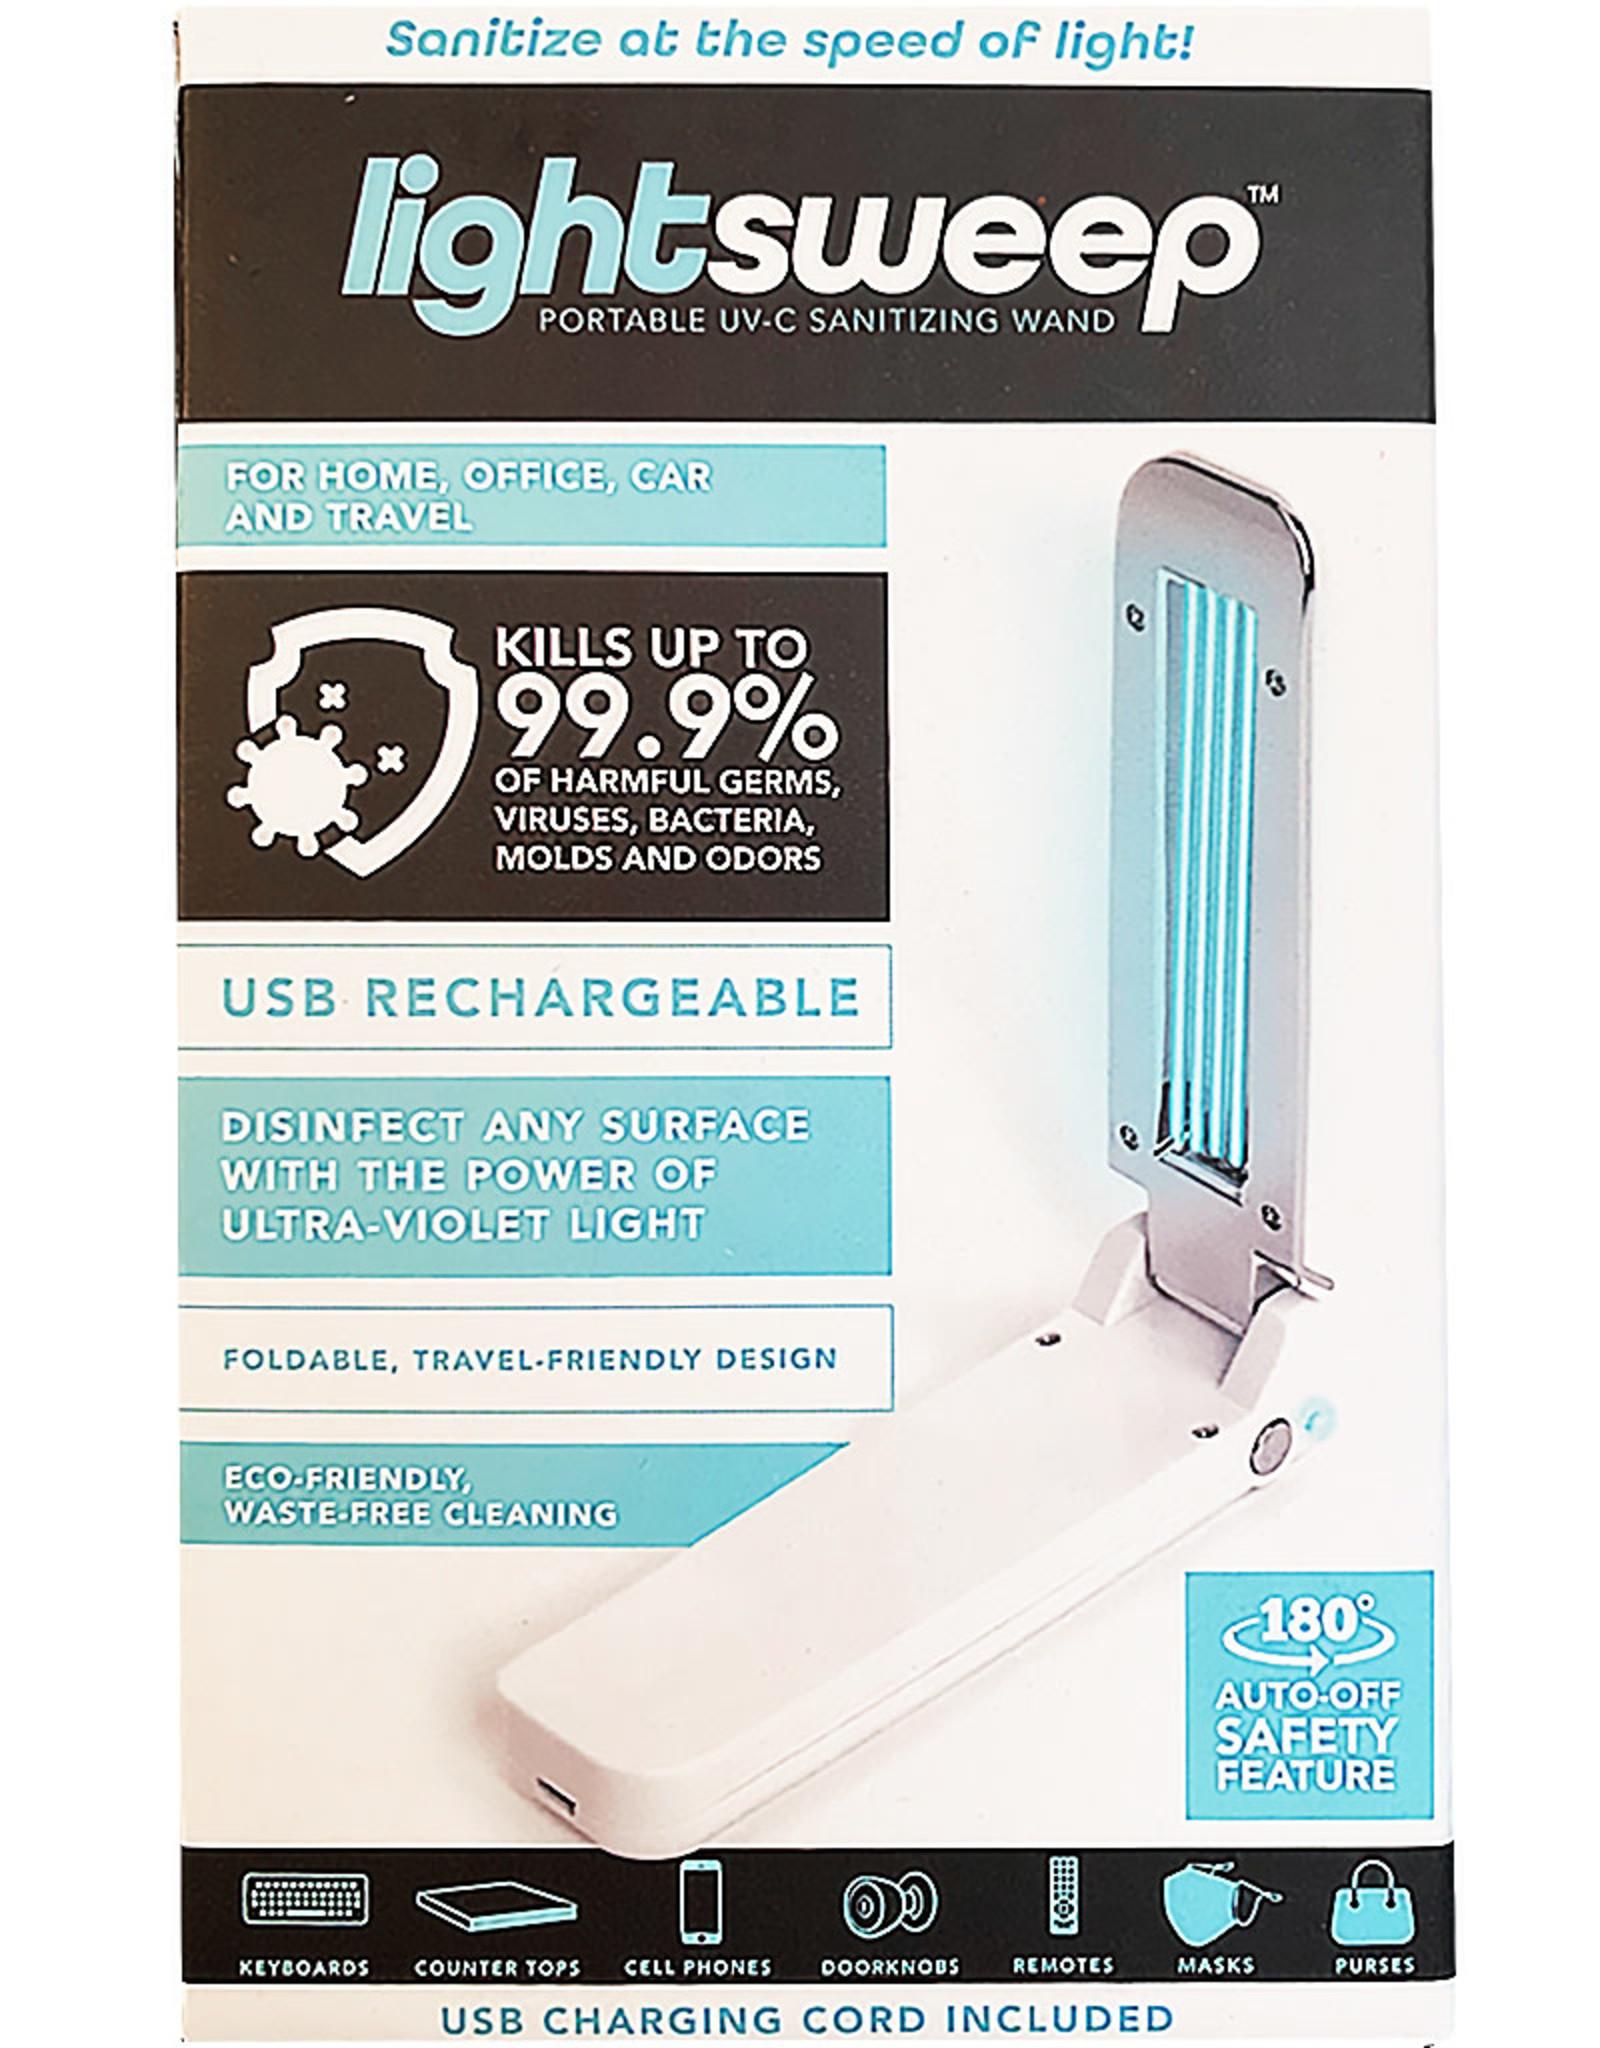 LightSweep Portable UV-C Sanitizing Wand